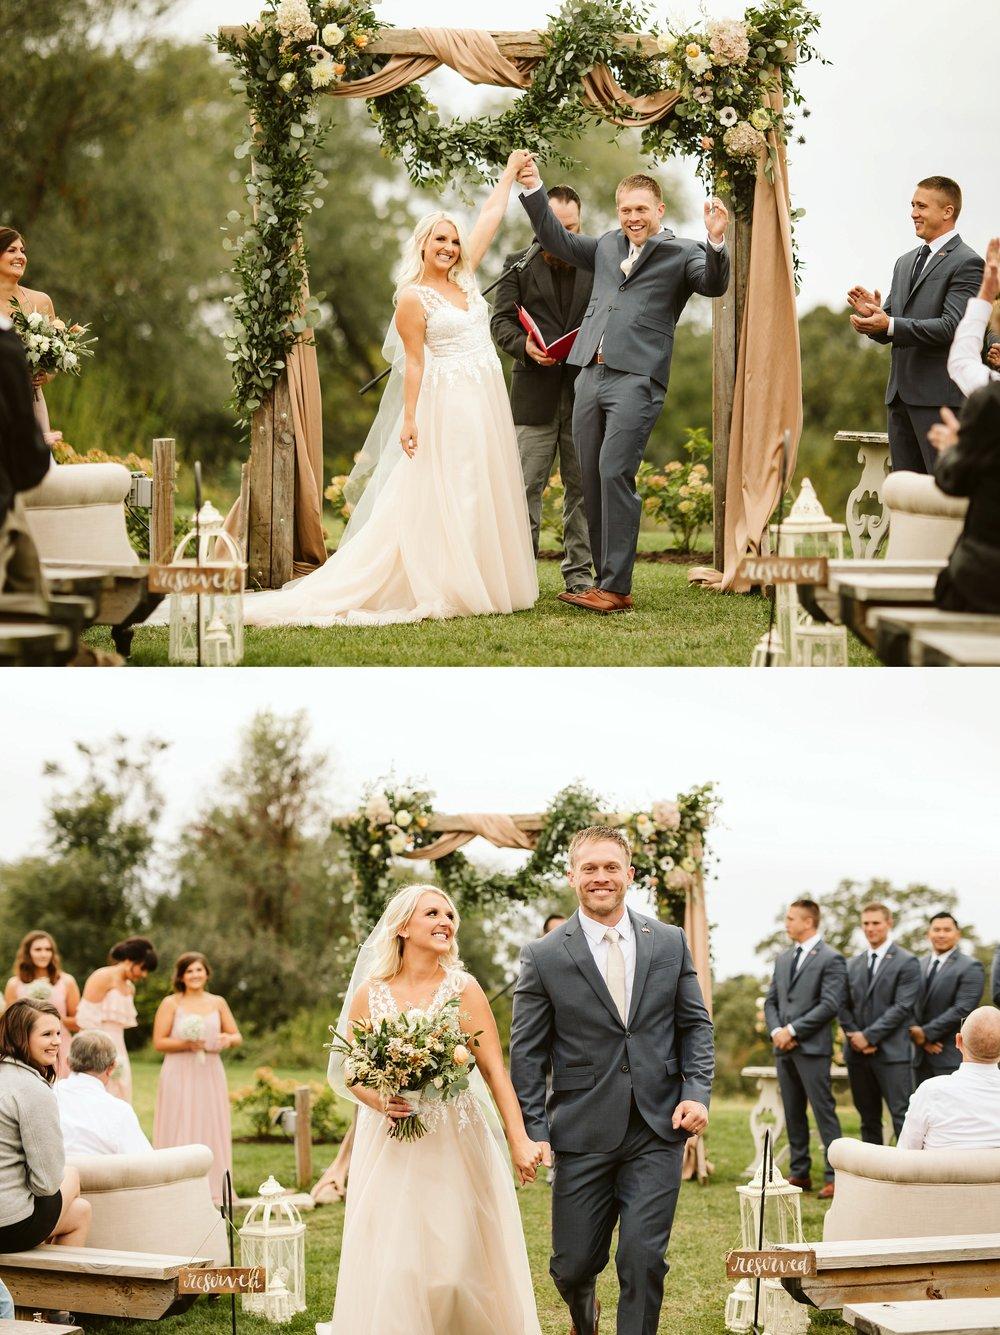 john-p-furber-farm-wedding-in-september-blush-and-coral-flowers-132.jpg